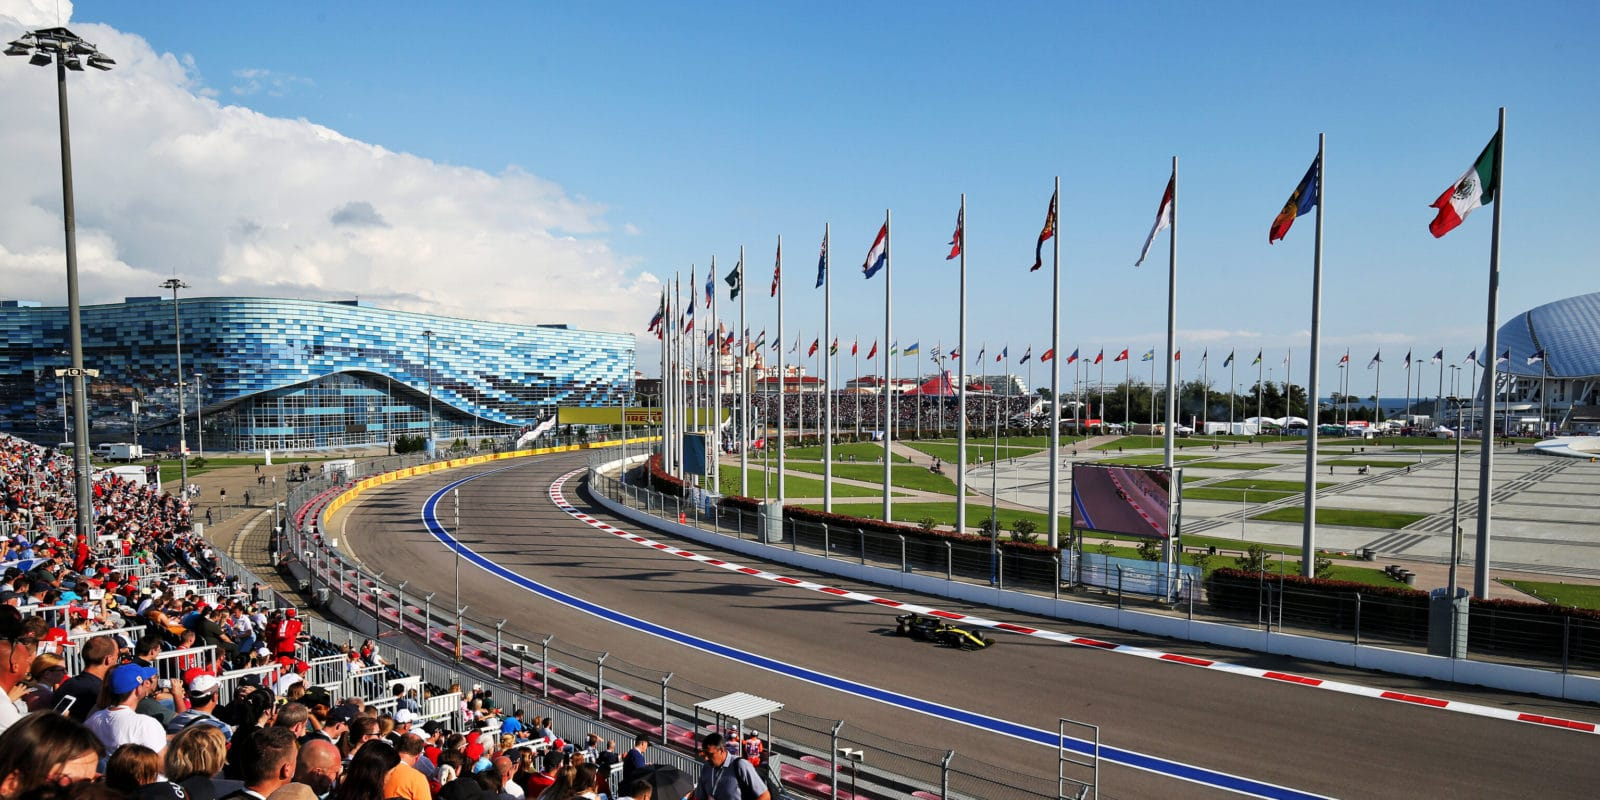 FIA schválila kalendář F1 pro rok 2020